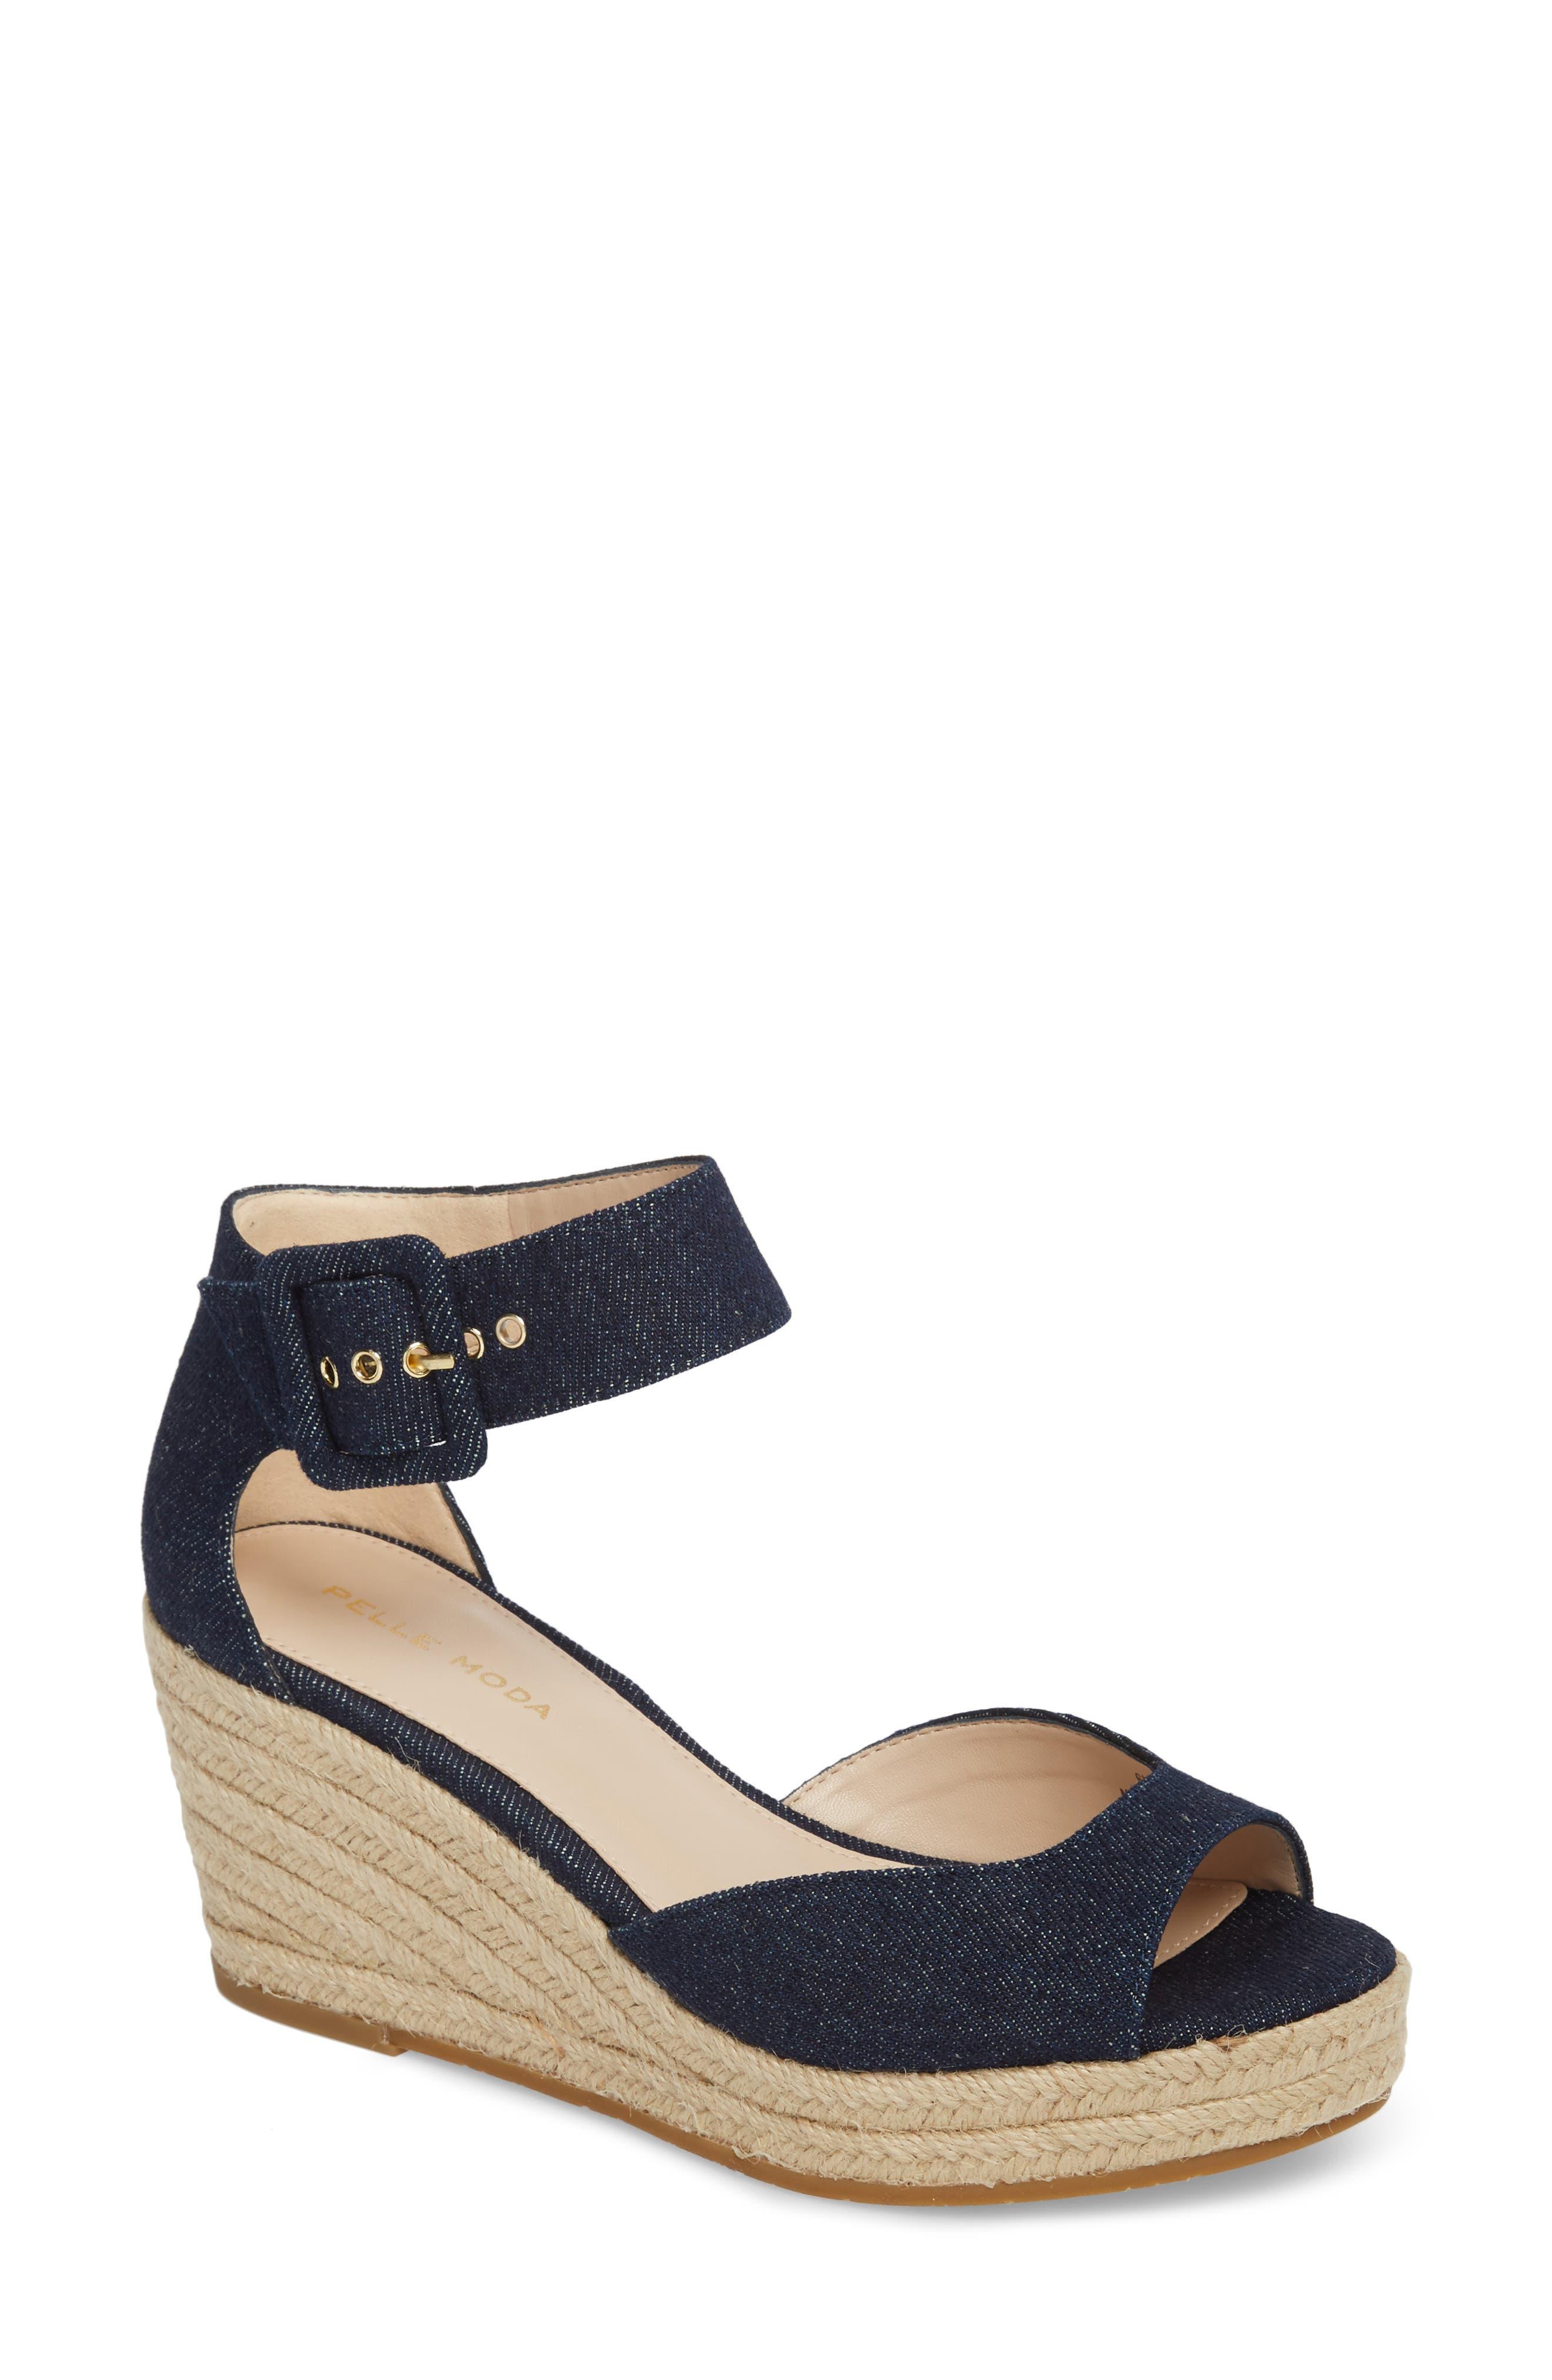 Main Image - Pelle Moda Kauai Platform Wedge Sandal (Women)